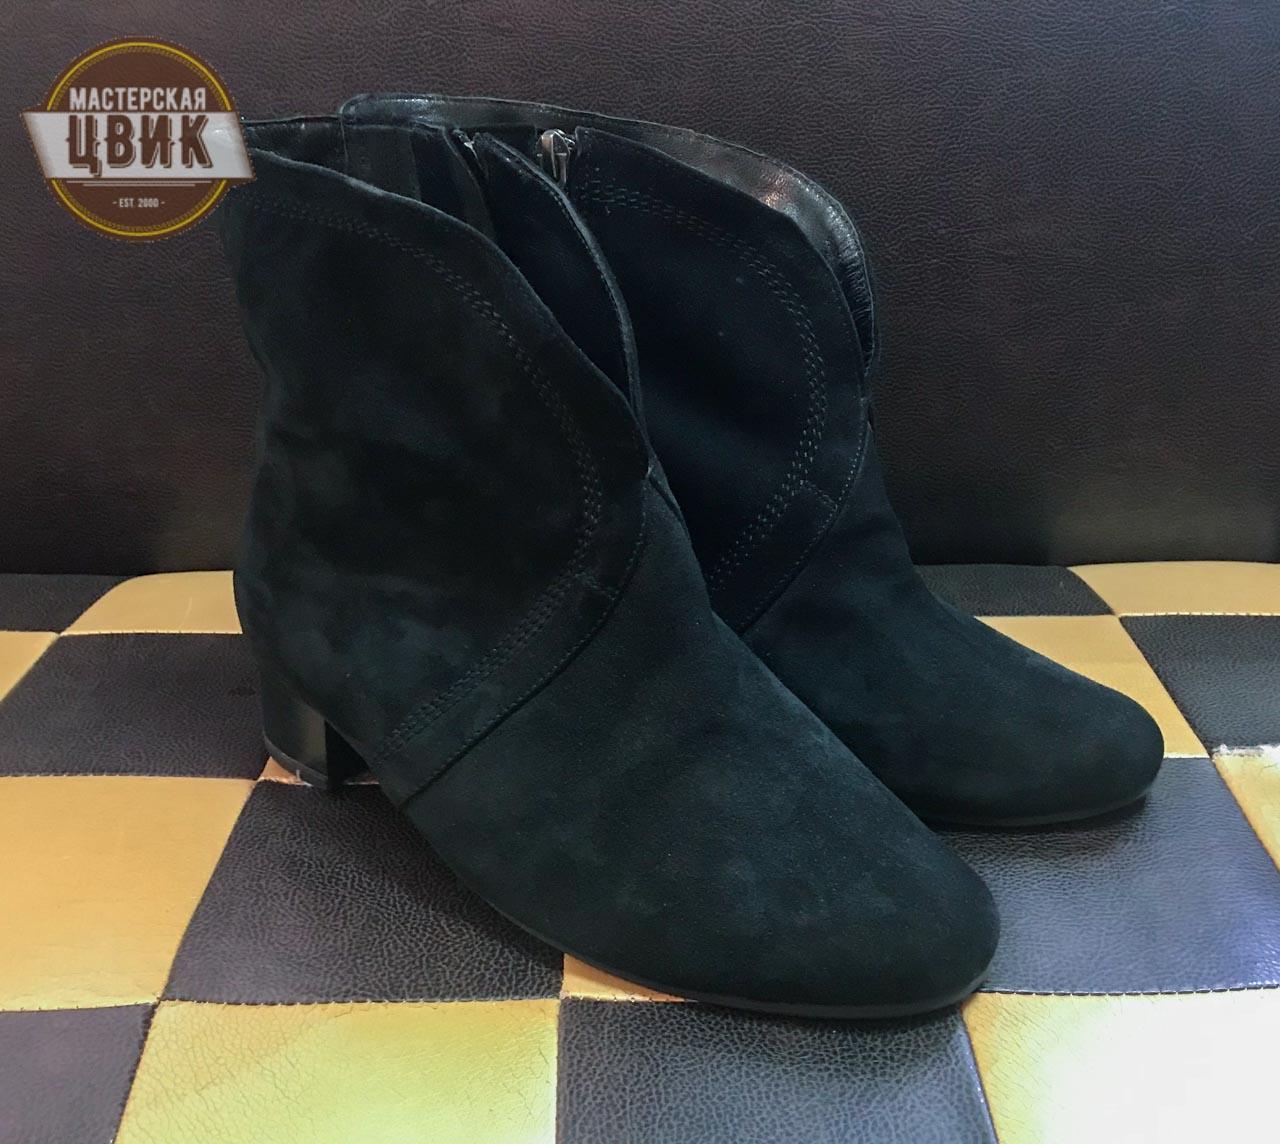 individualnyj-poshiv-obuvi-minsk-6 Индивидуальный пошив обуви